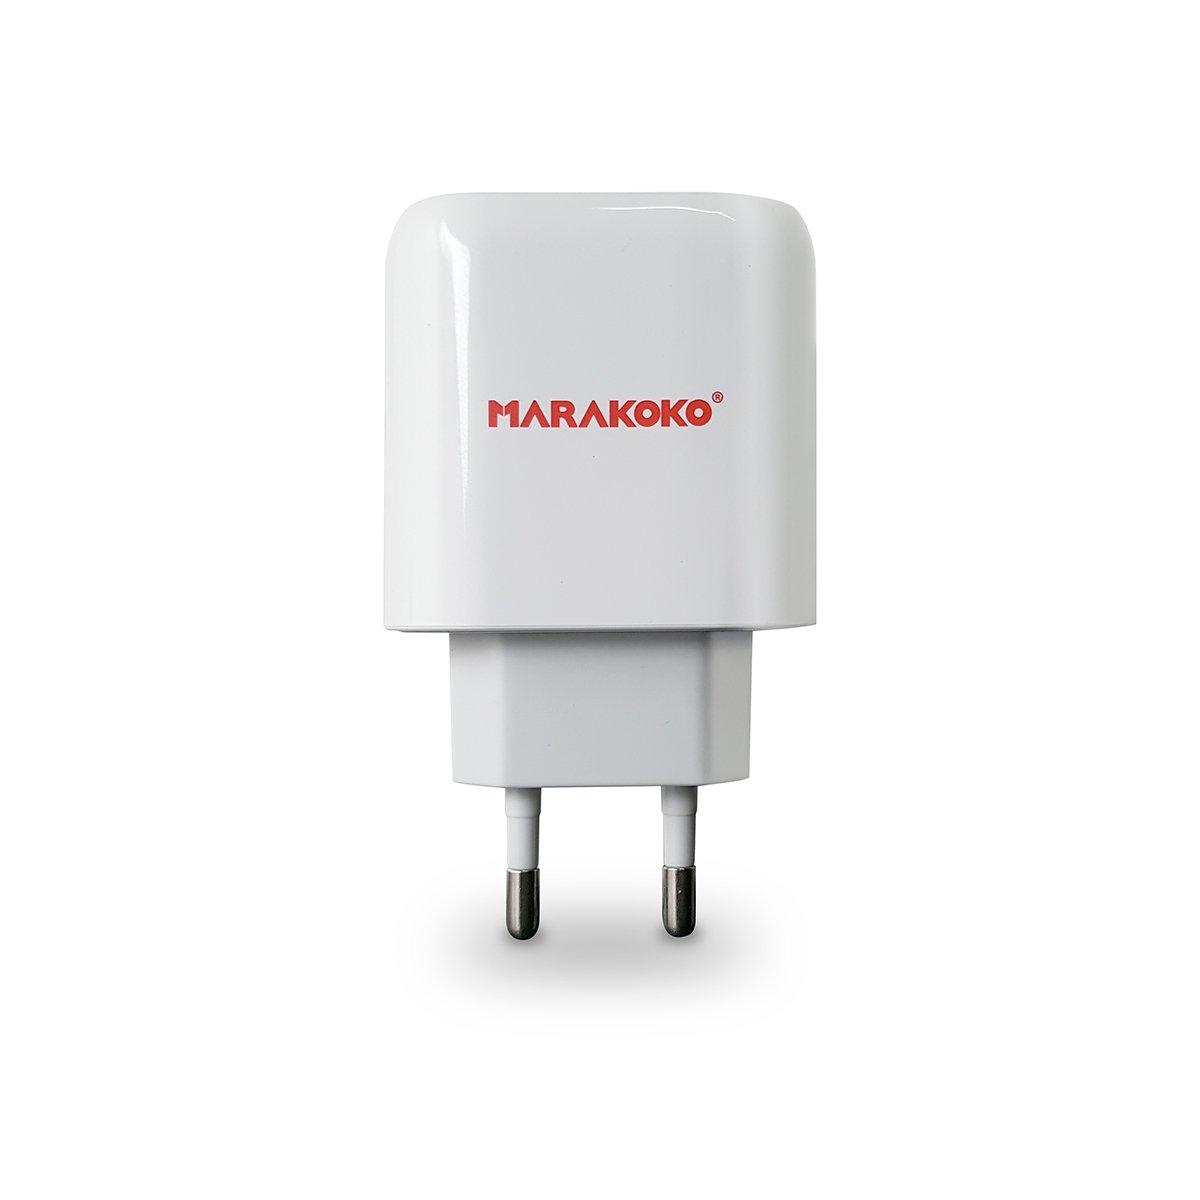 Sạc điện thoại Marakoko MA16, 2 cổng sạc SmartID, 5V/2.4A Max